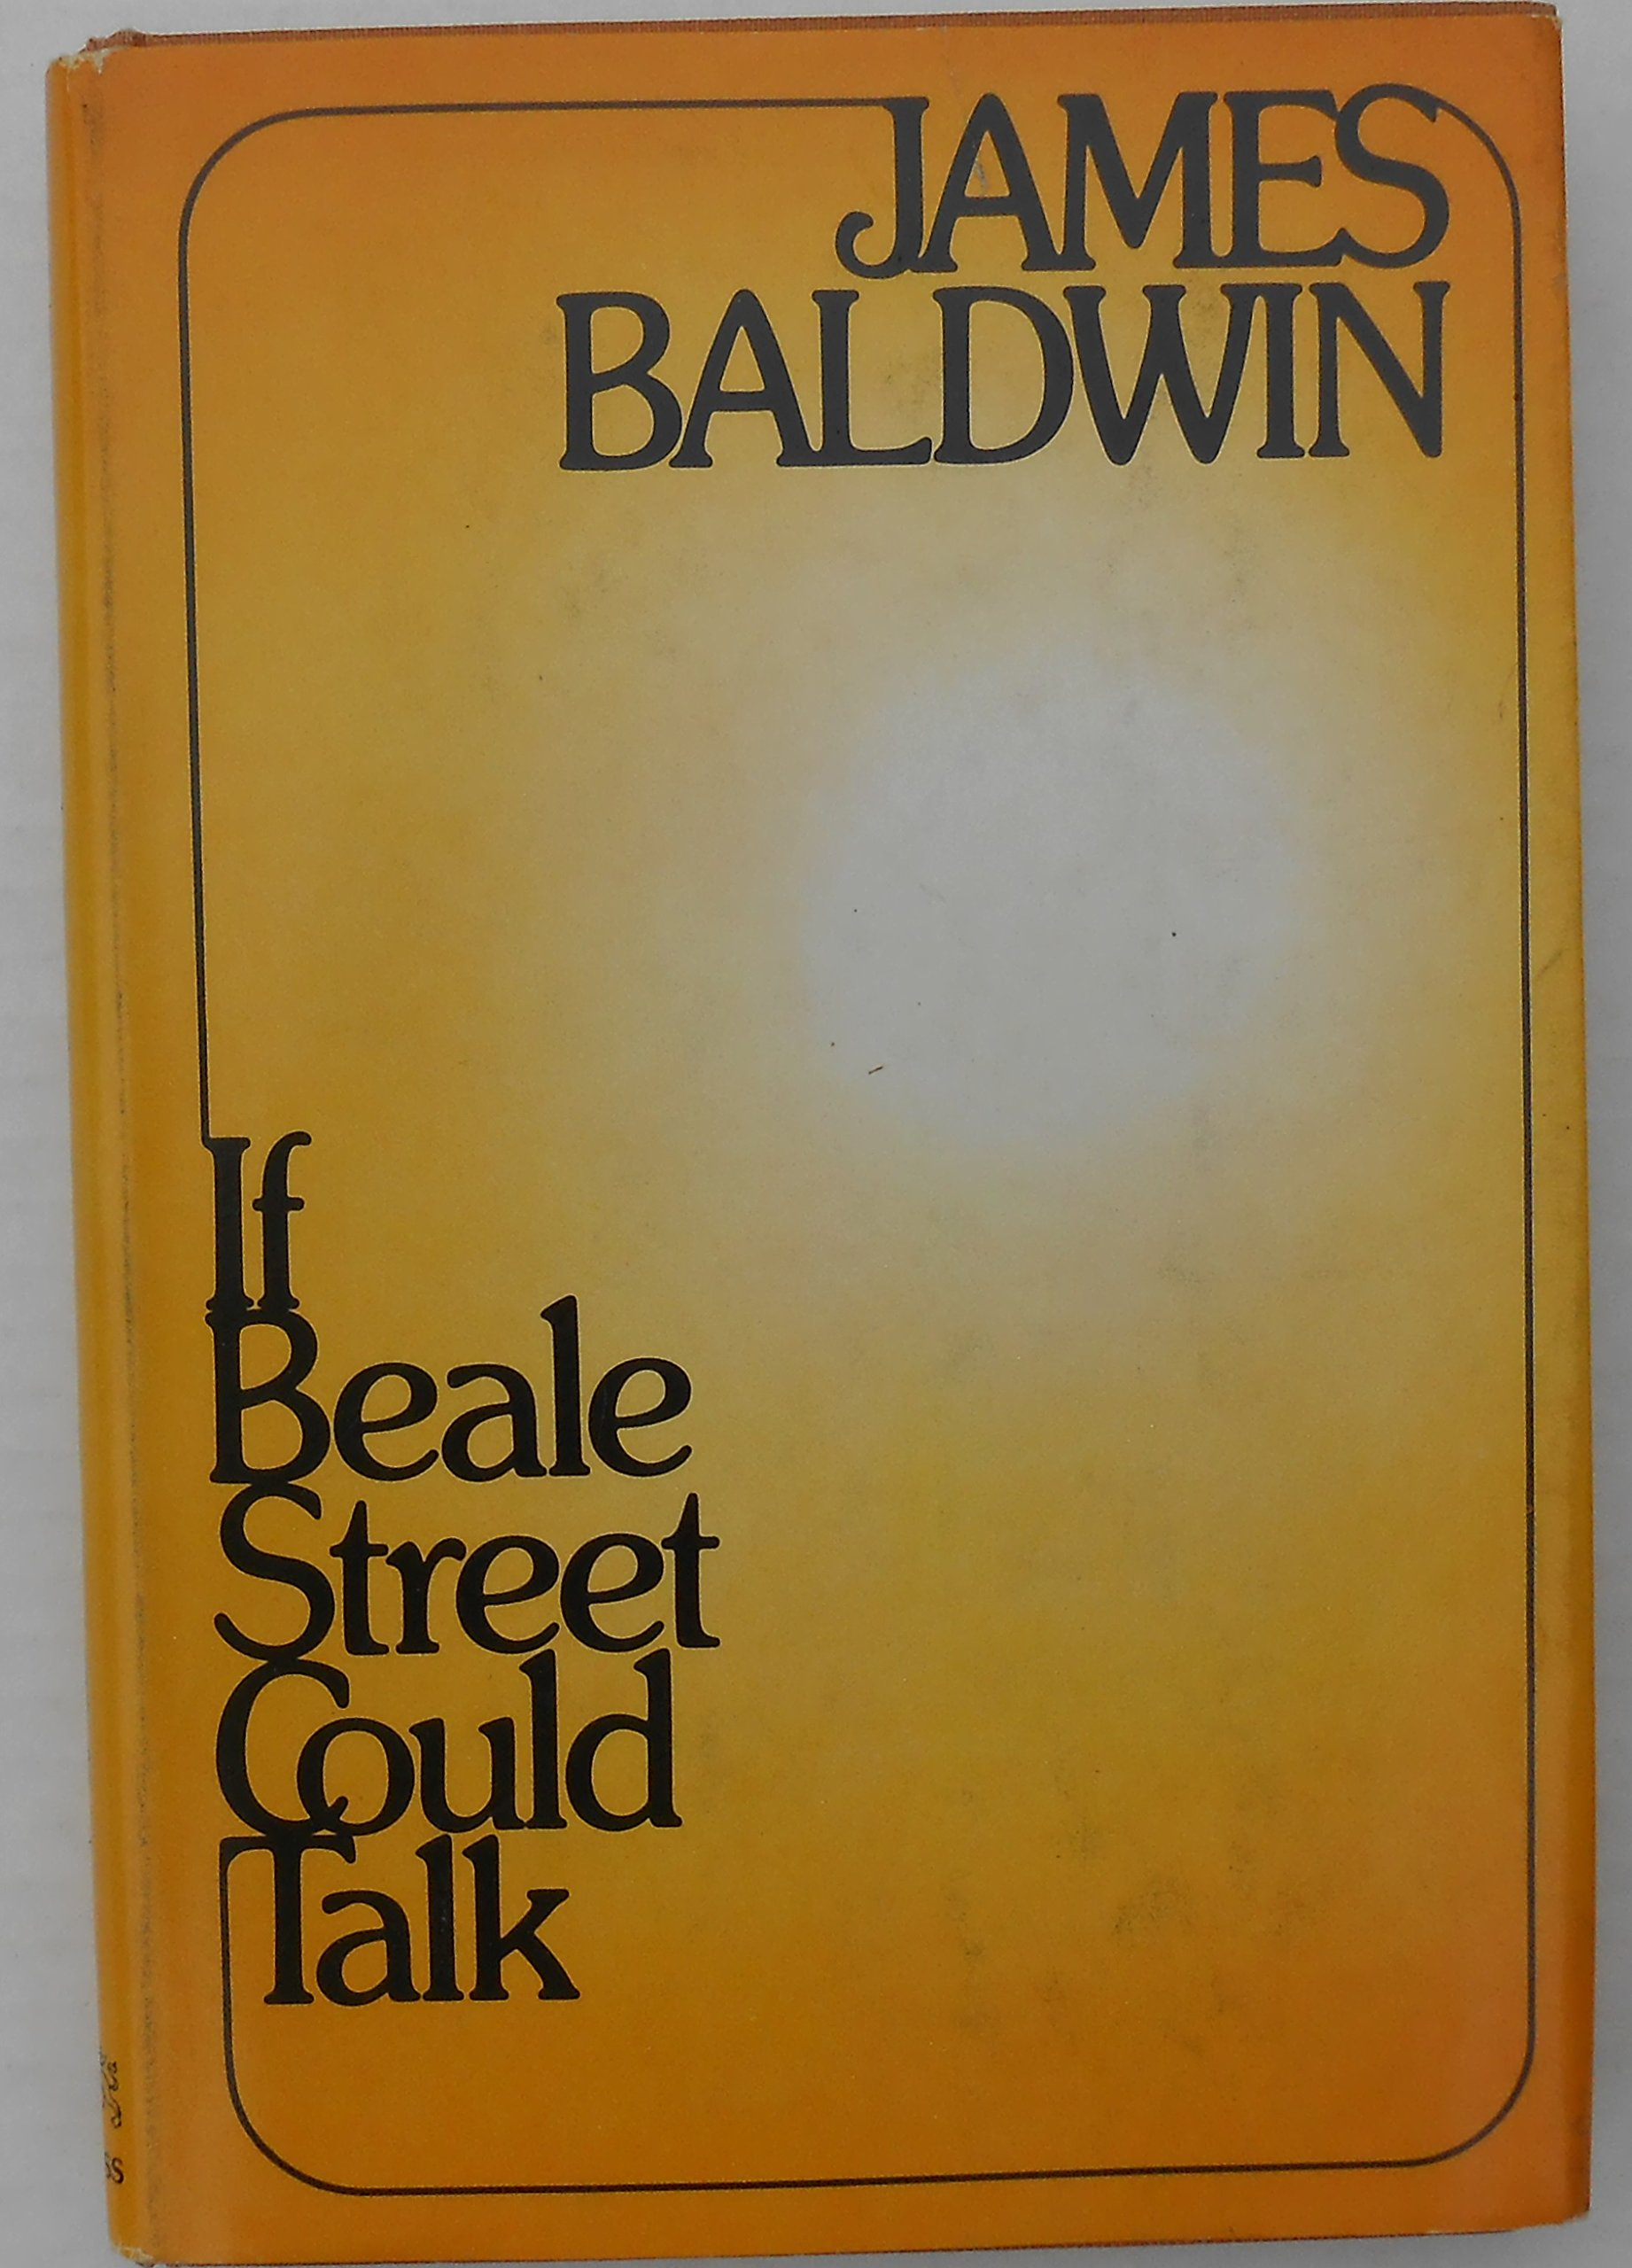 IF BEALE STREET COULD TALK. A Novel.